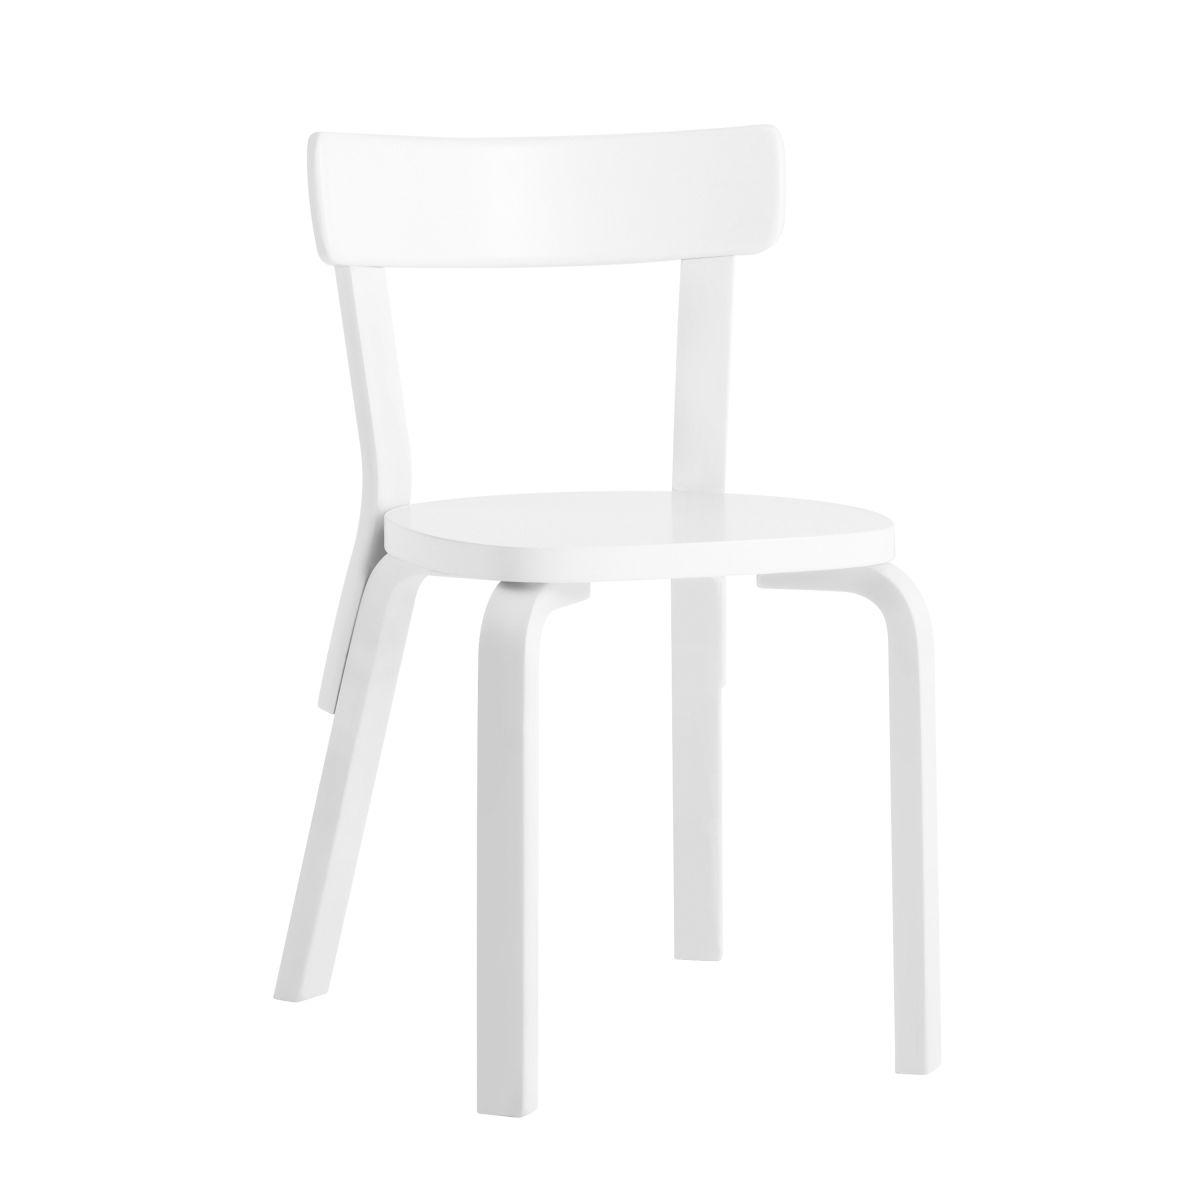 Chair 69 white lacquer